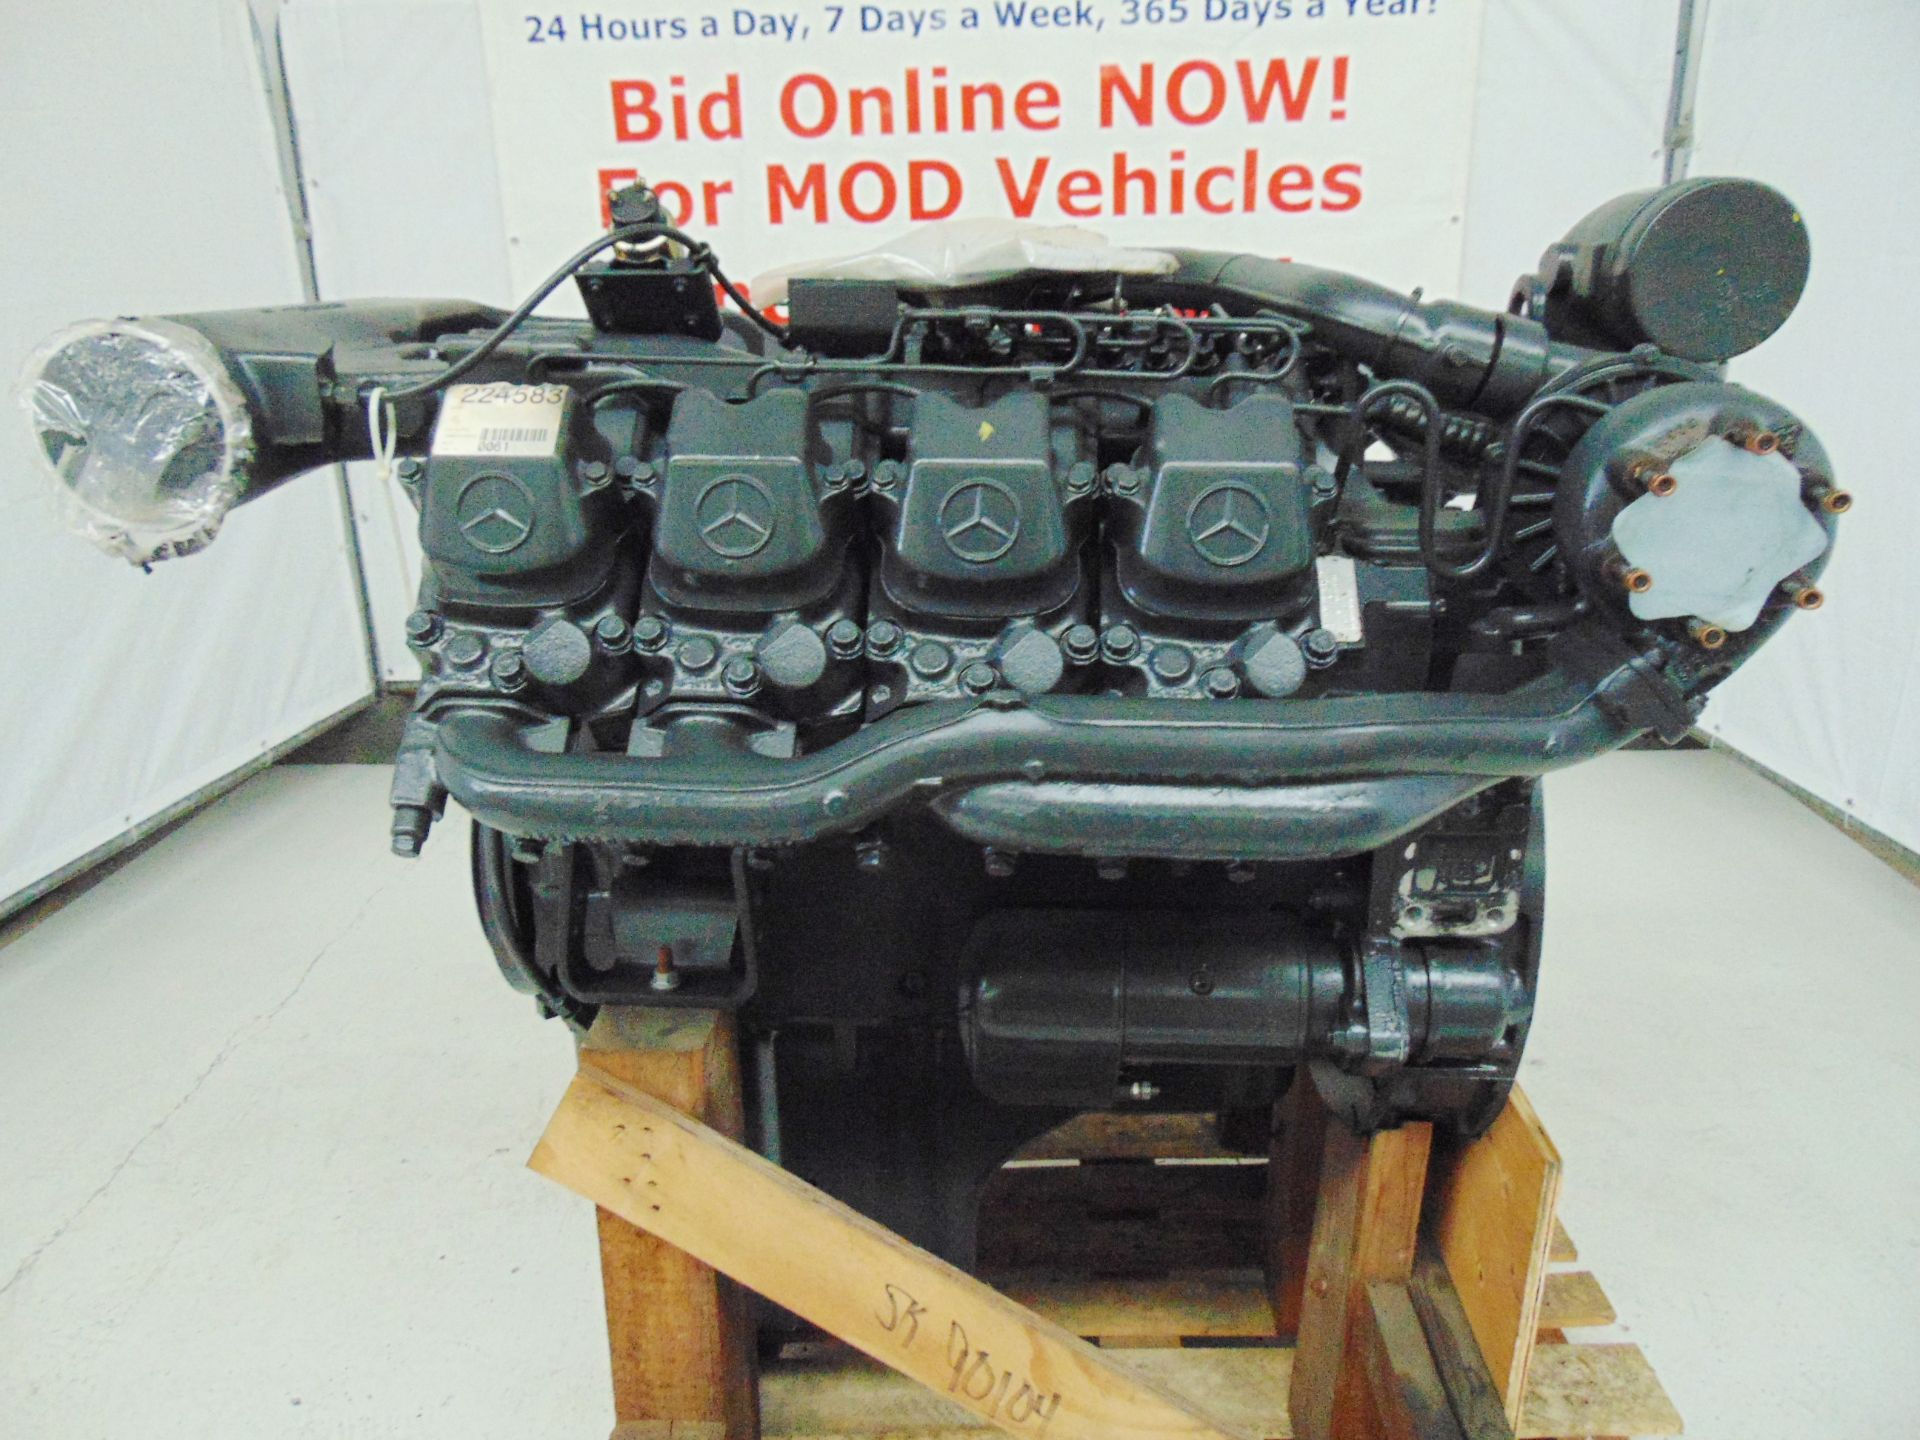 Lot 1 - Brand New & Unused Mercedes-Benz OM442LA V8 Twin Turbo Diesel Engine